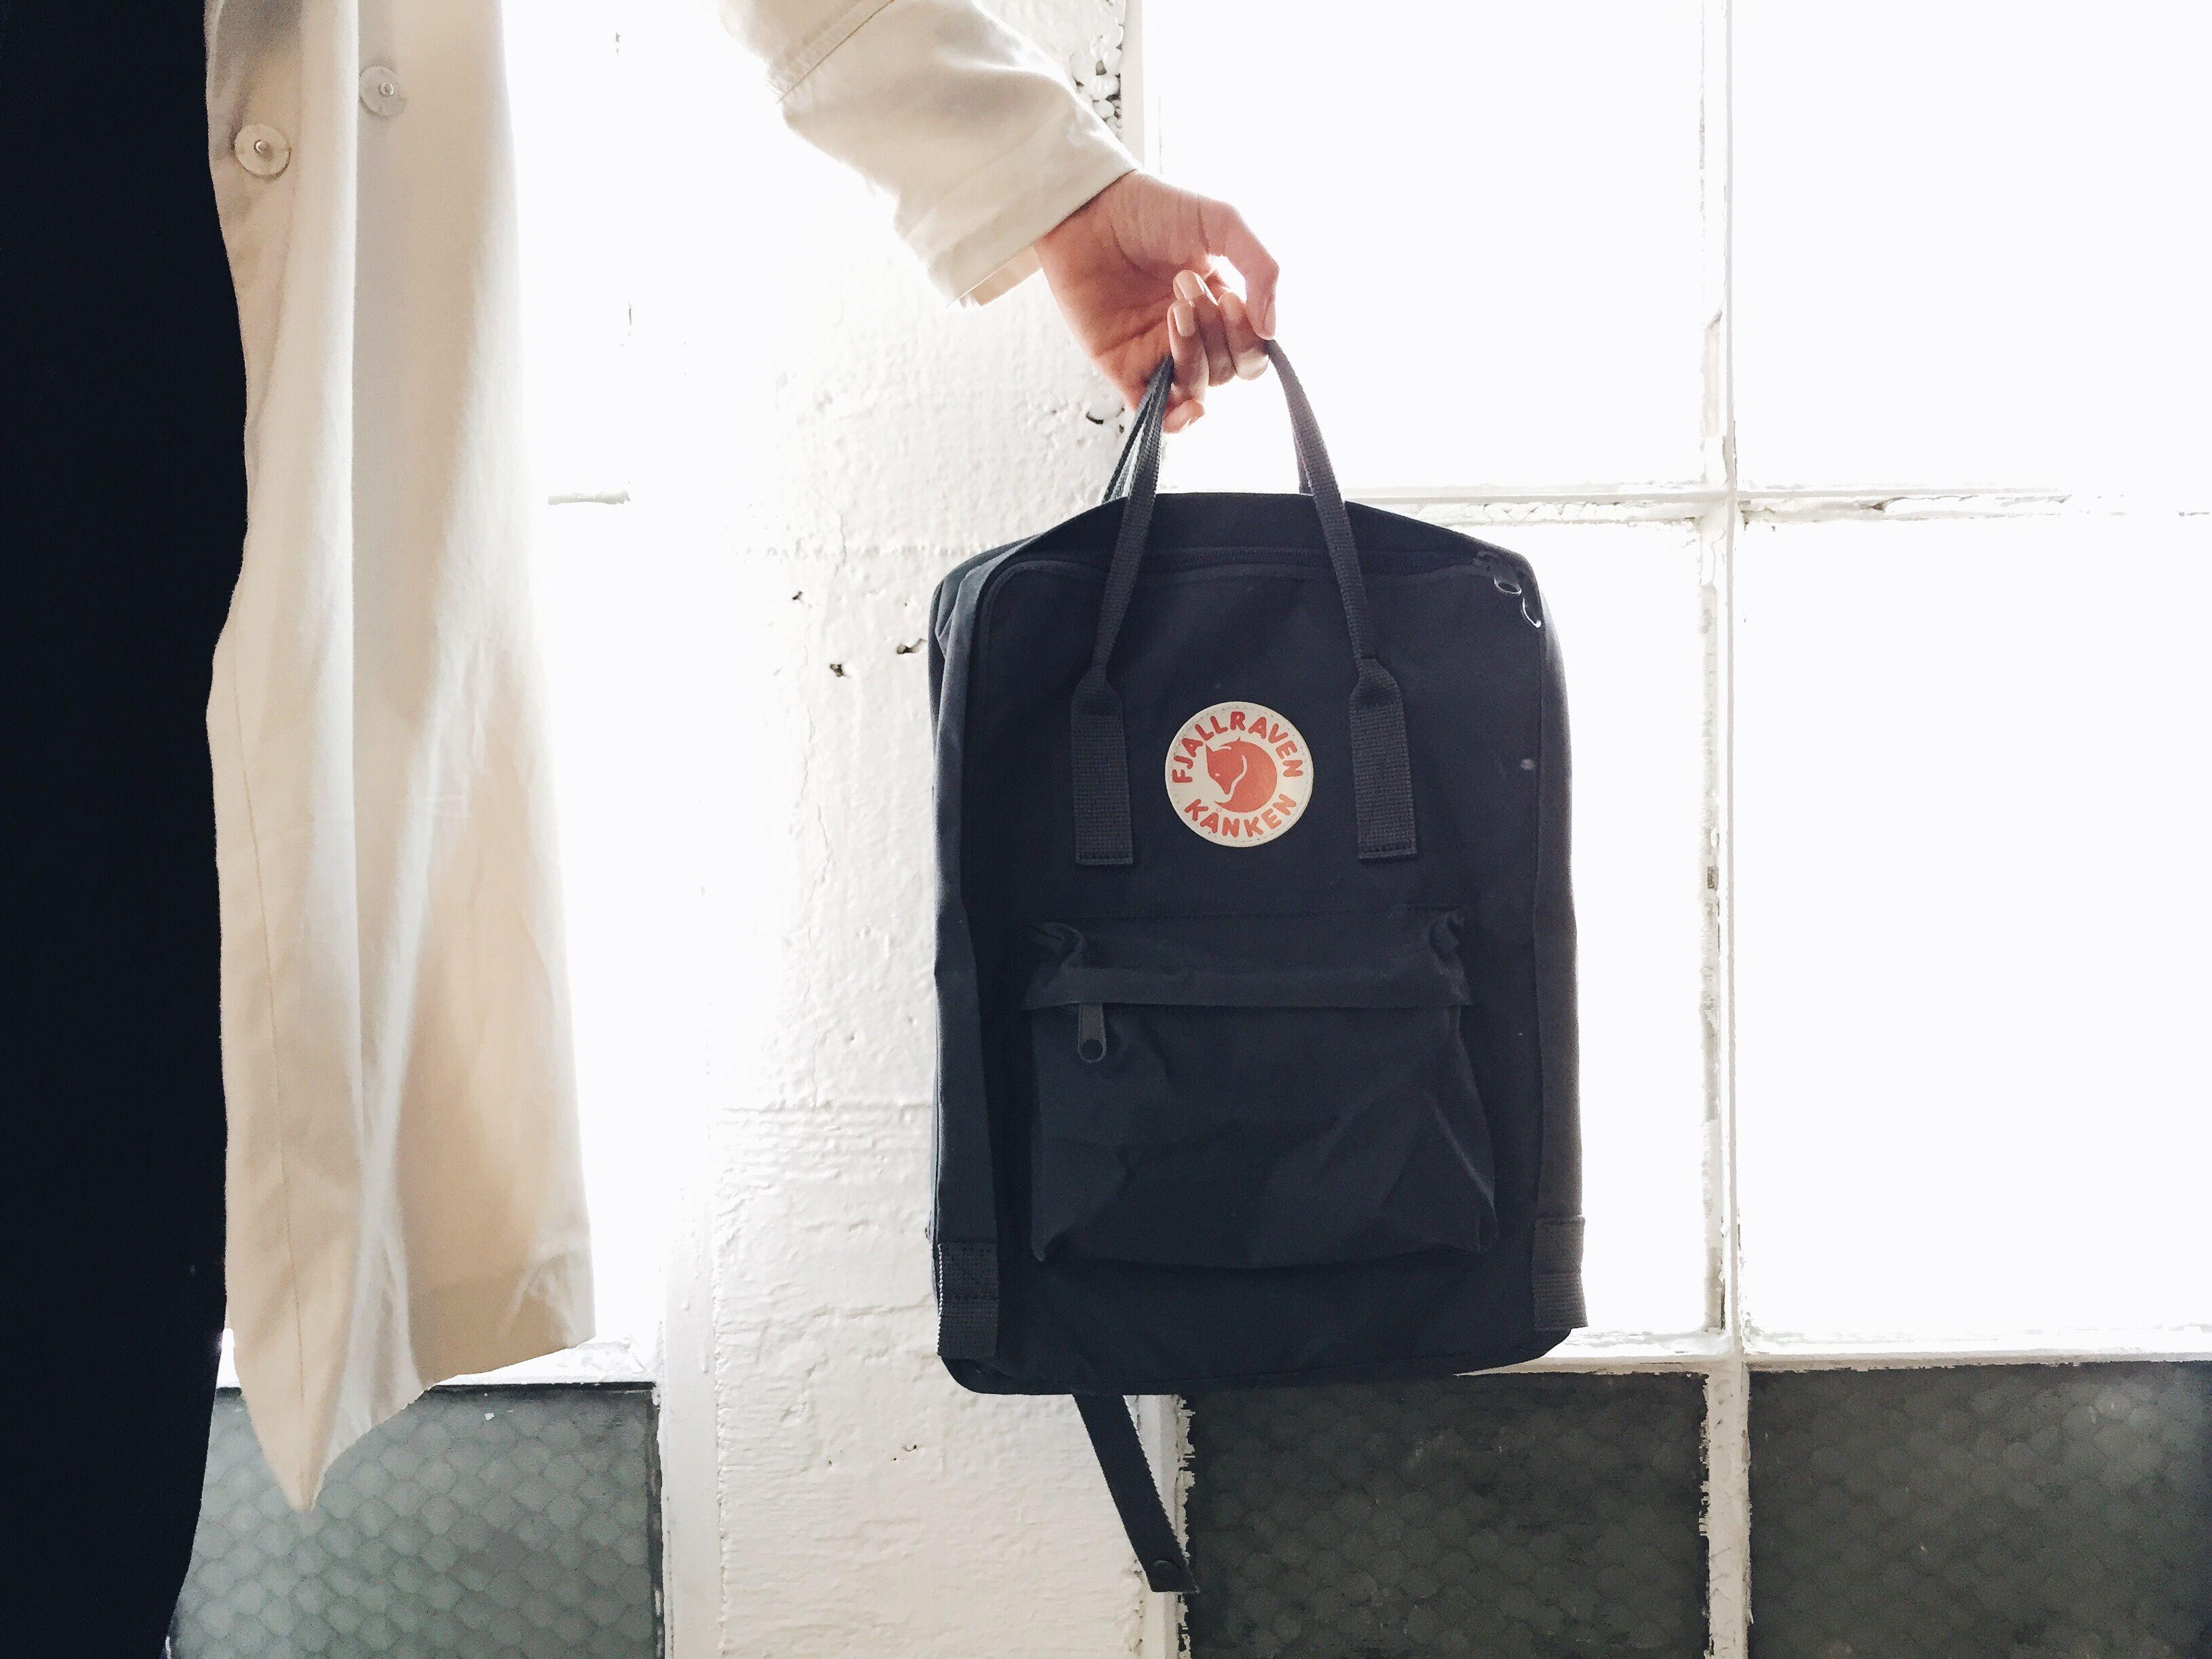 Fjallraven Kanken Classic Bag Review - Graphite  26eb5de38b57d